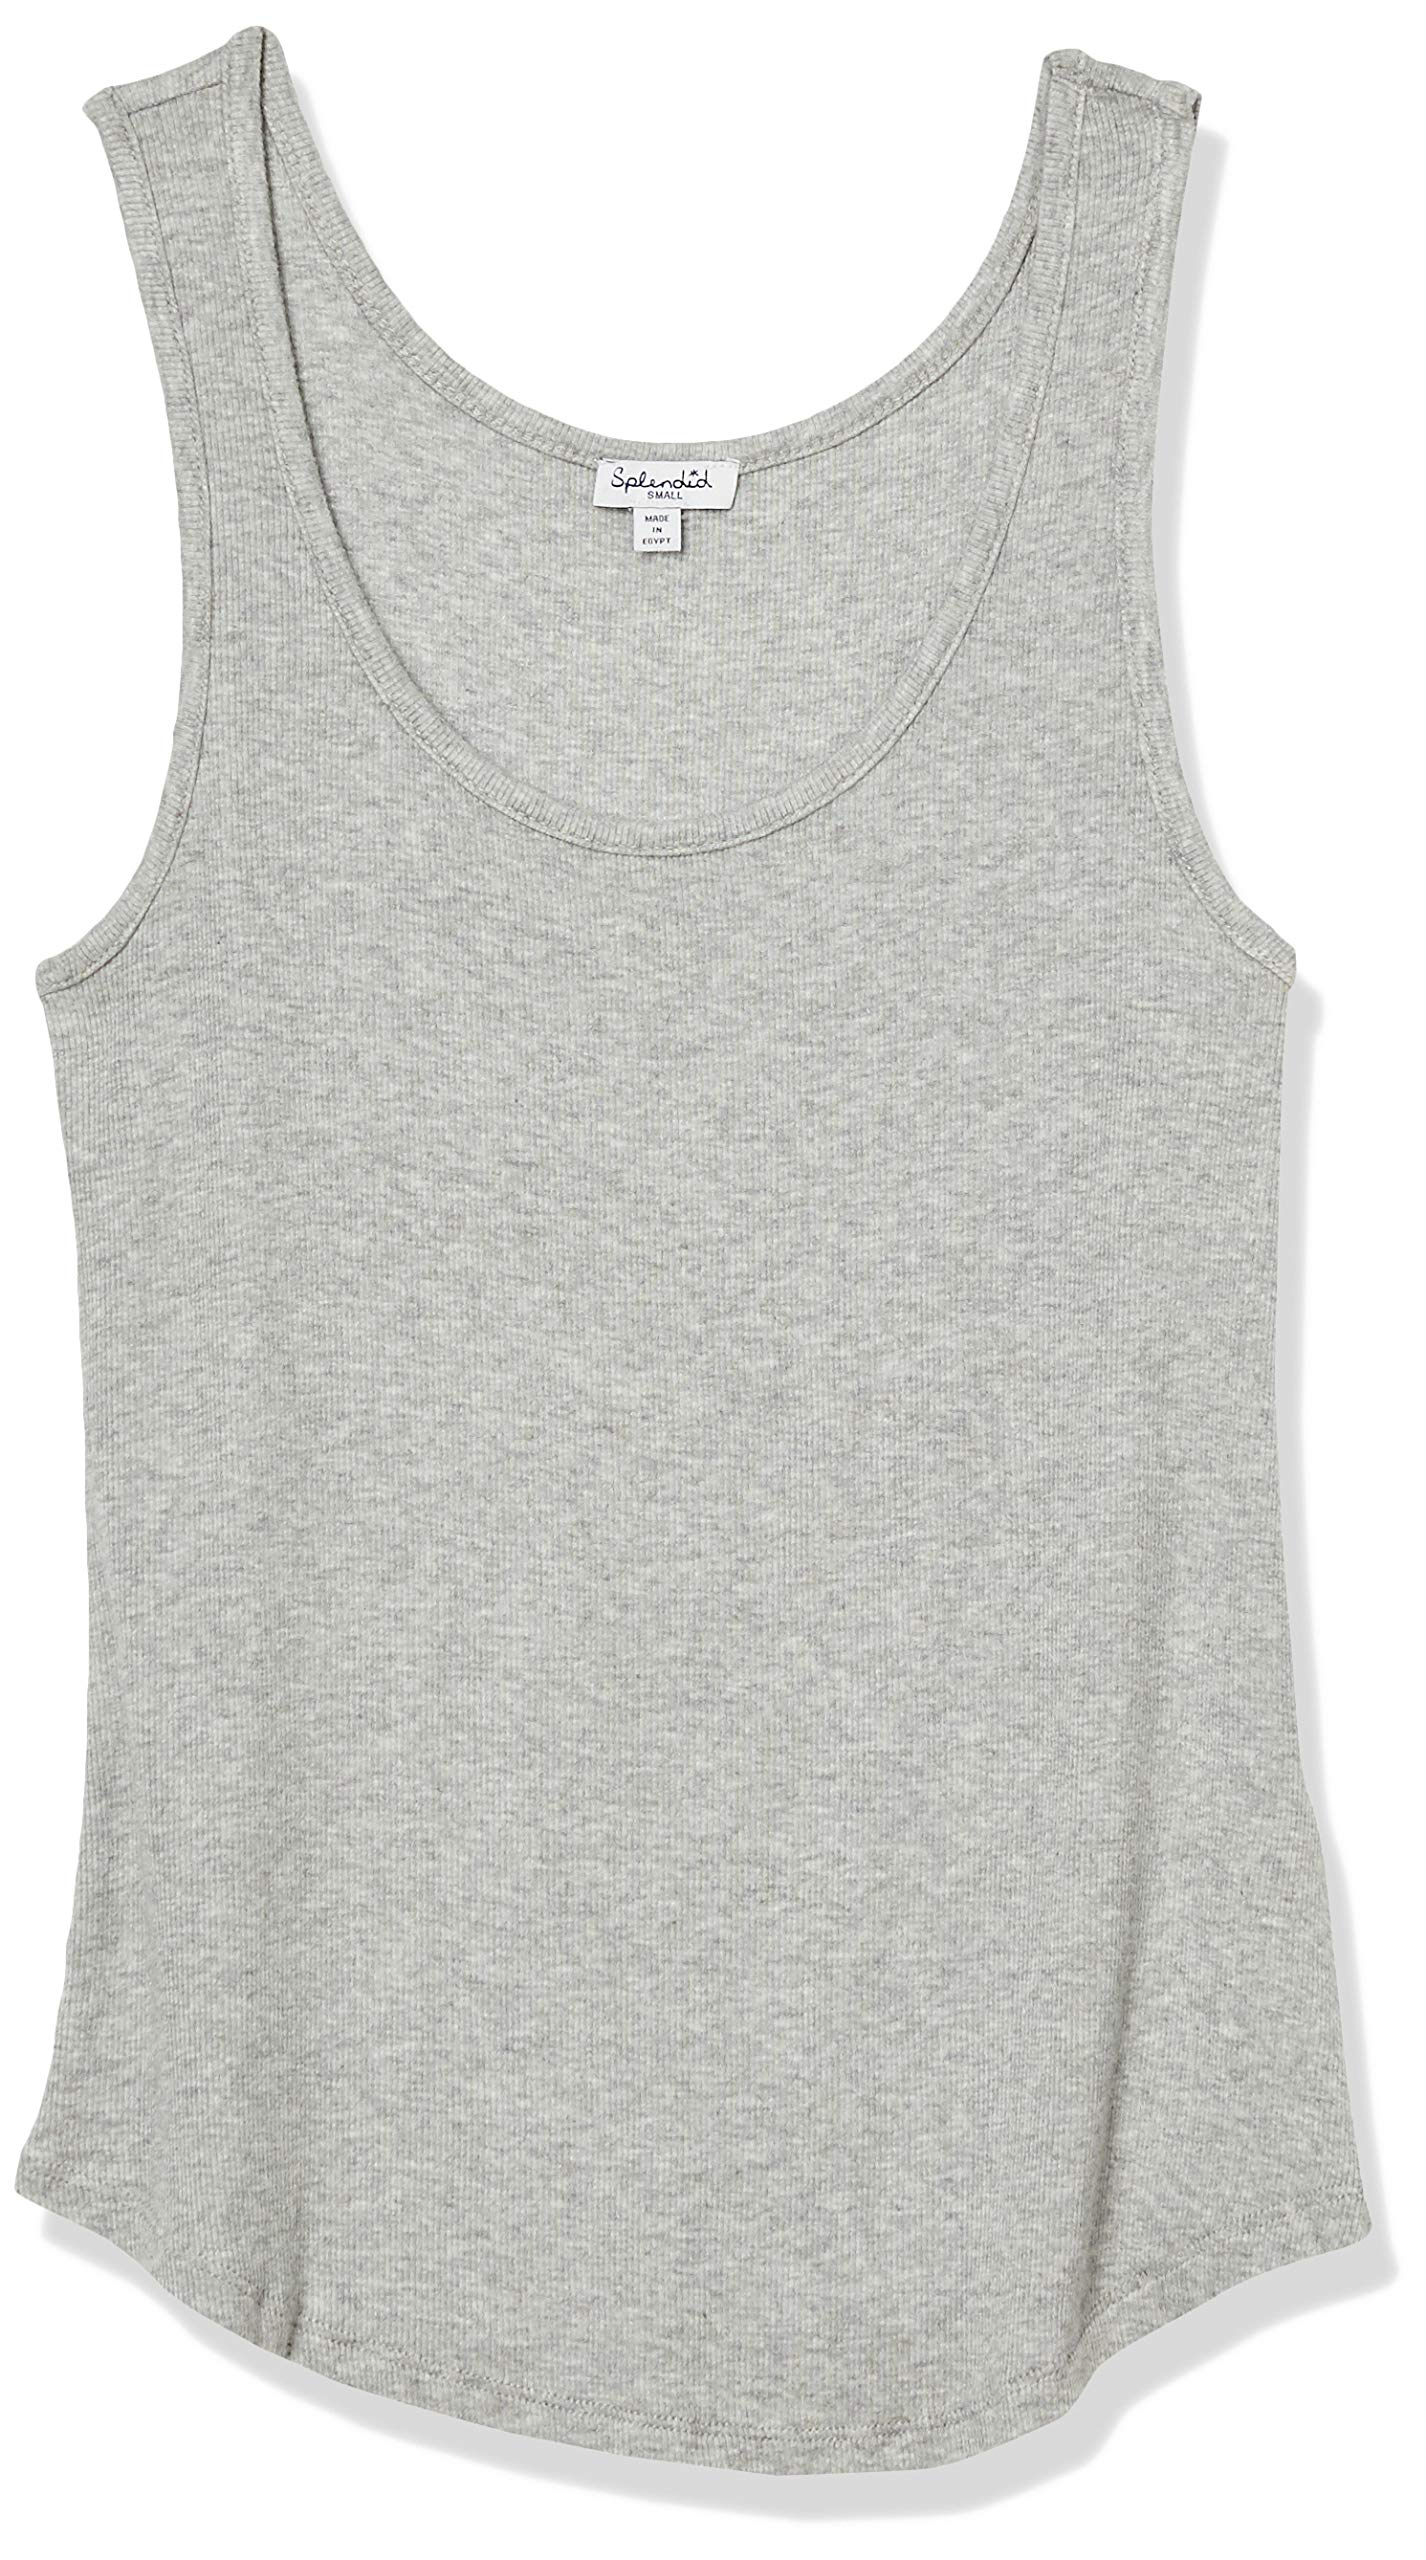 Splendid Women's 2x1 Rib Sleeveless Scoop Tank Top